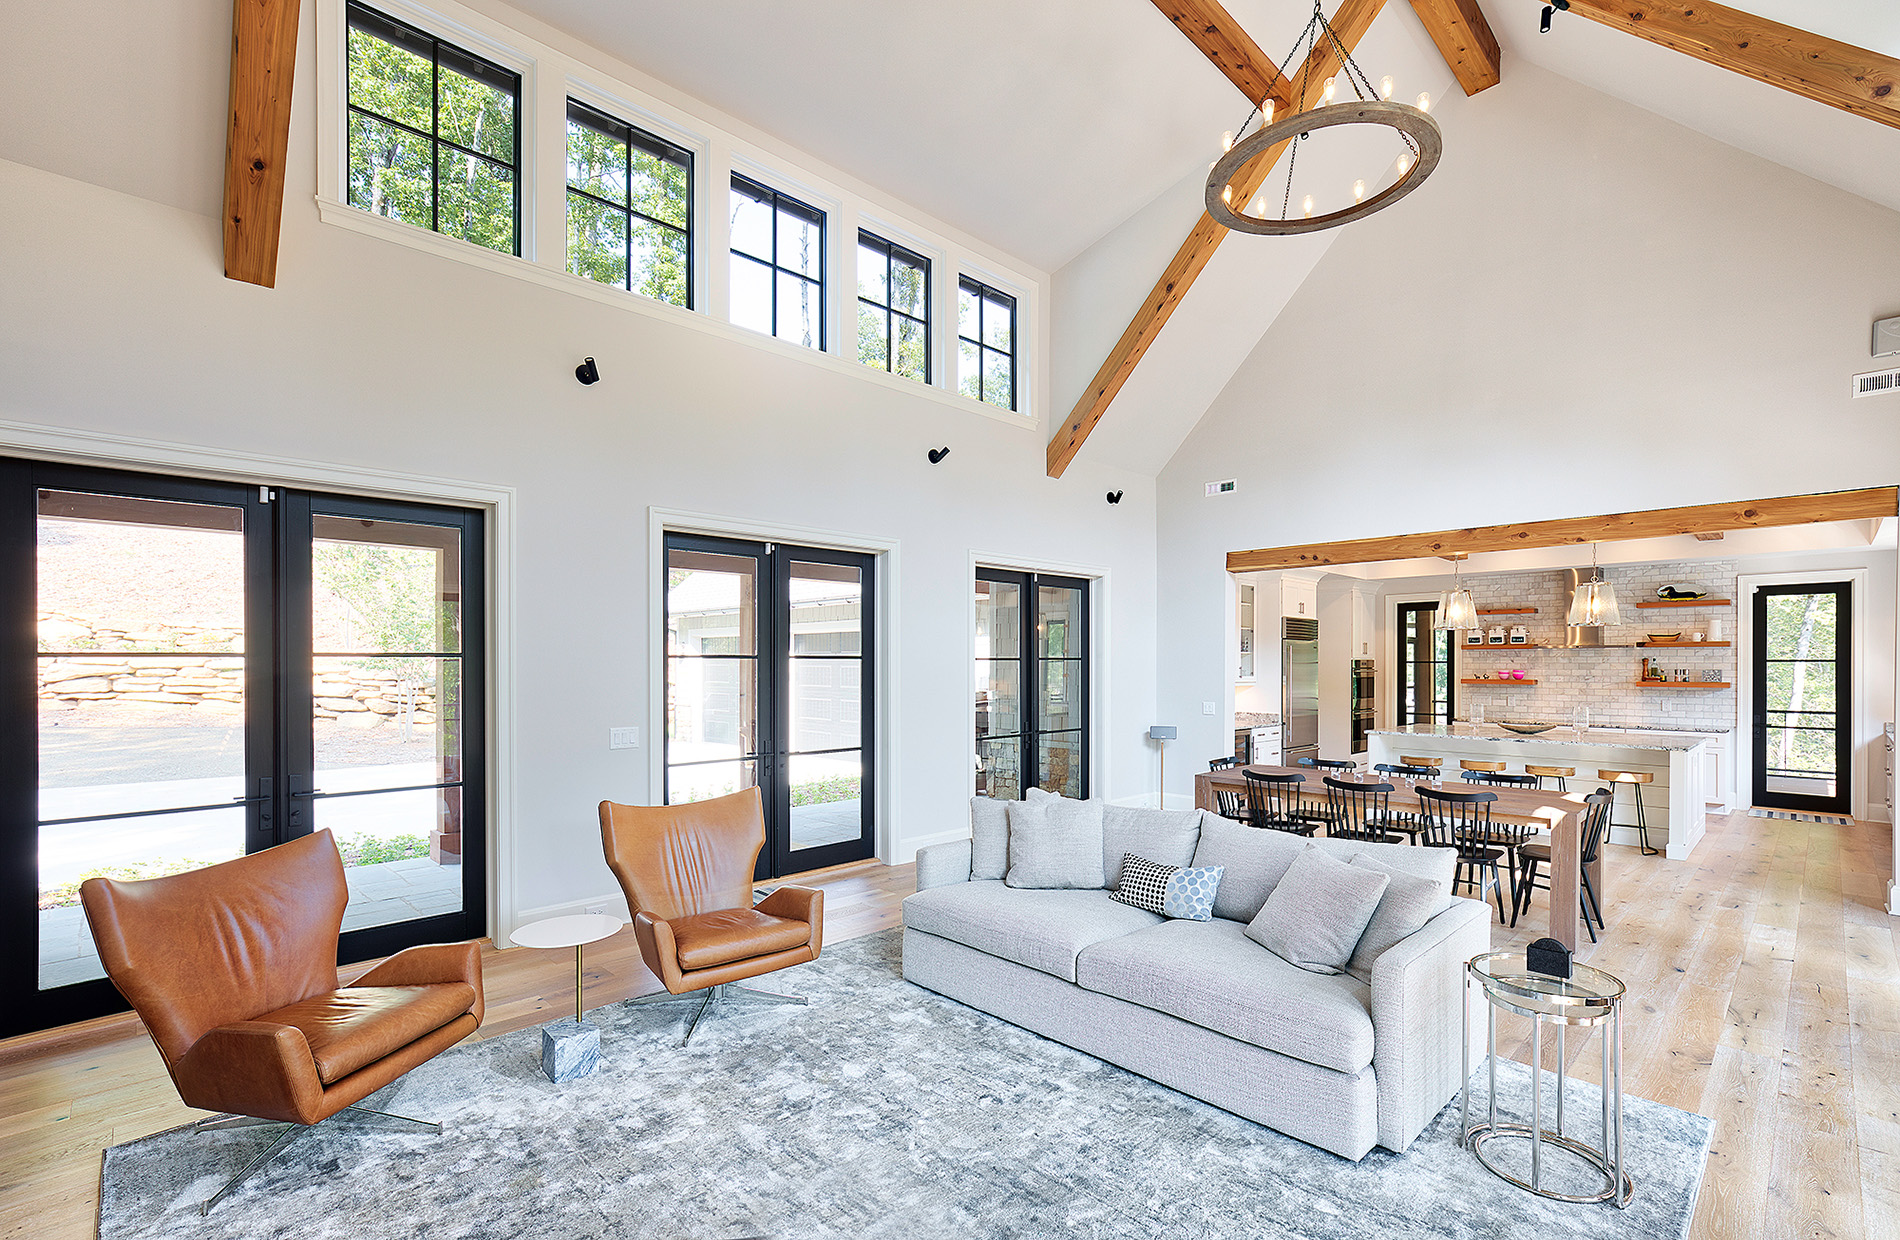 hickory custom home modern lake house open living space